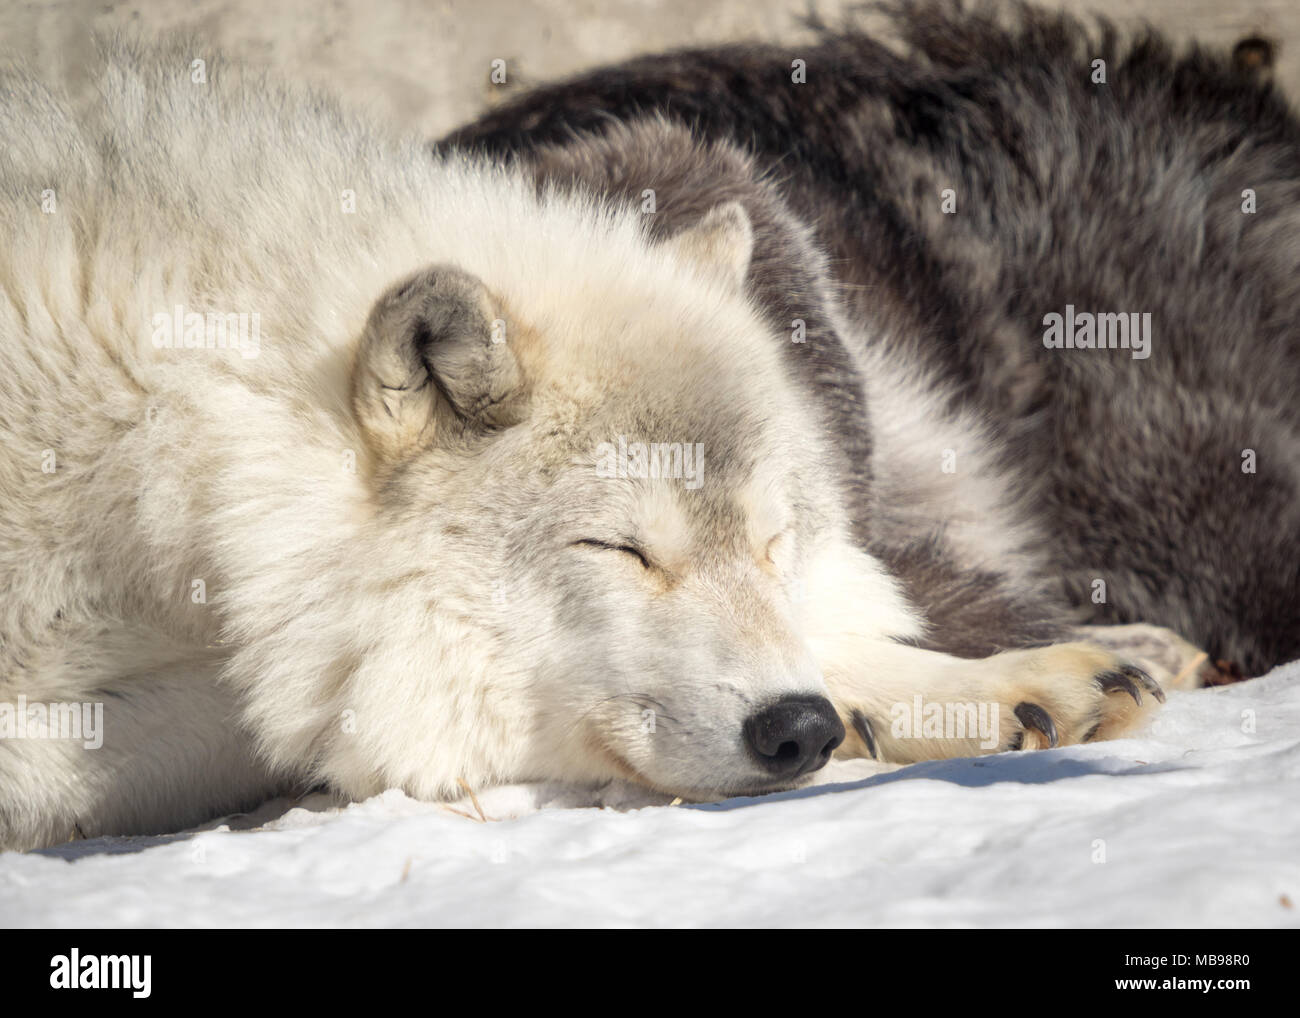 A sleeping gray wolf (Canis lupus) at the Saskatoon Forestry Farm Park and Zoo in Saskatoon, Saskatchewan, Canada. - Stock Image